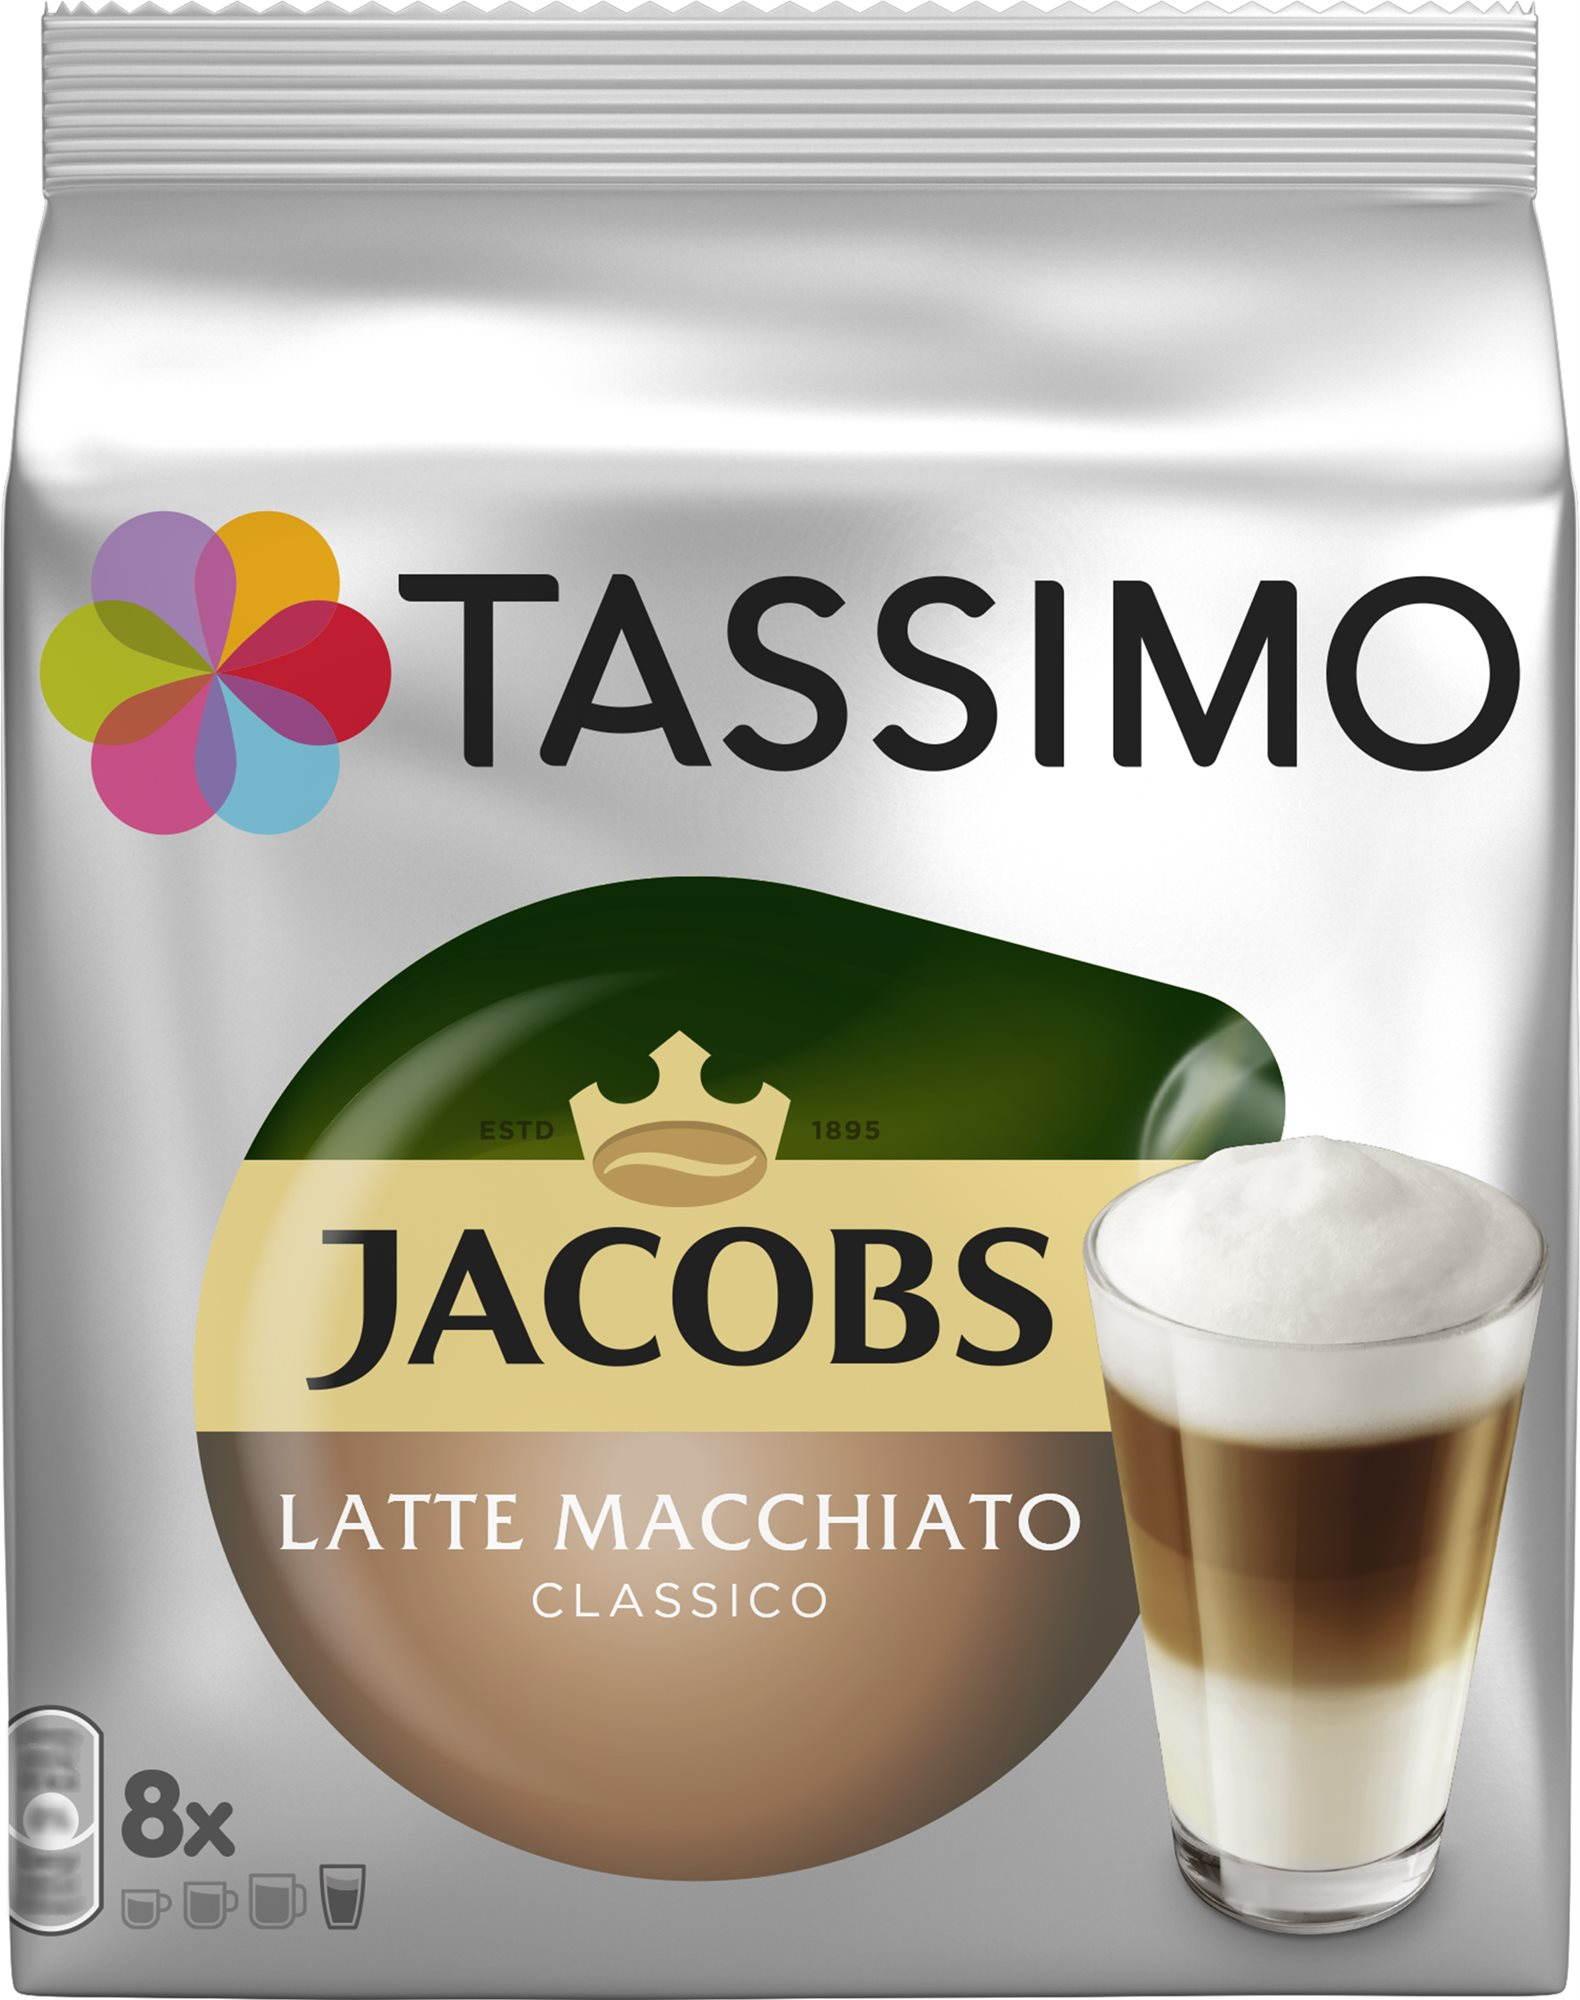 TASSIMO Jacobs Krönung Latte Macchiato 8 adag